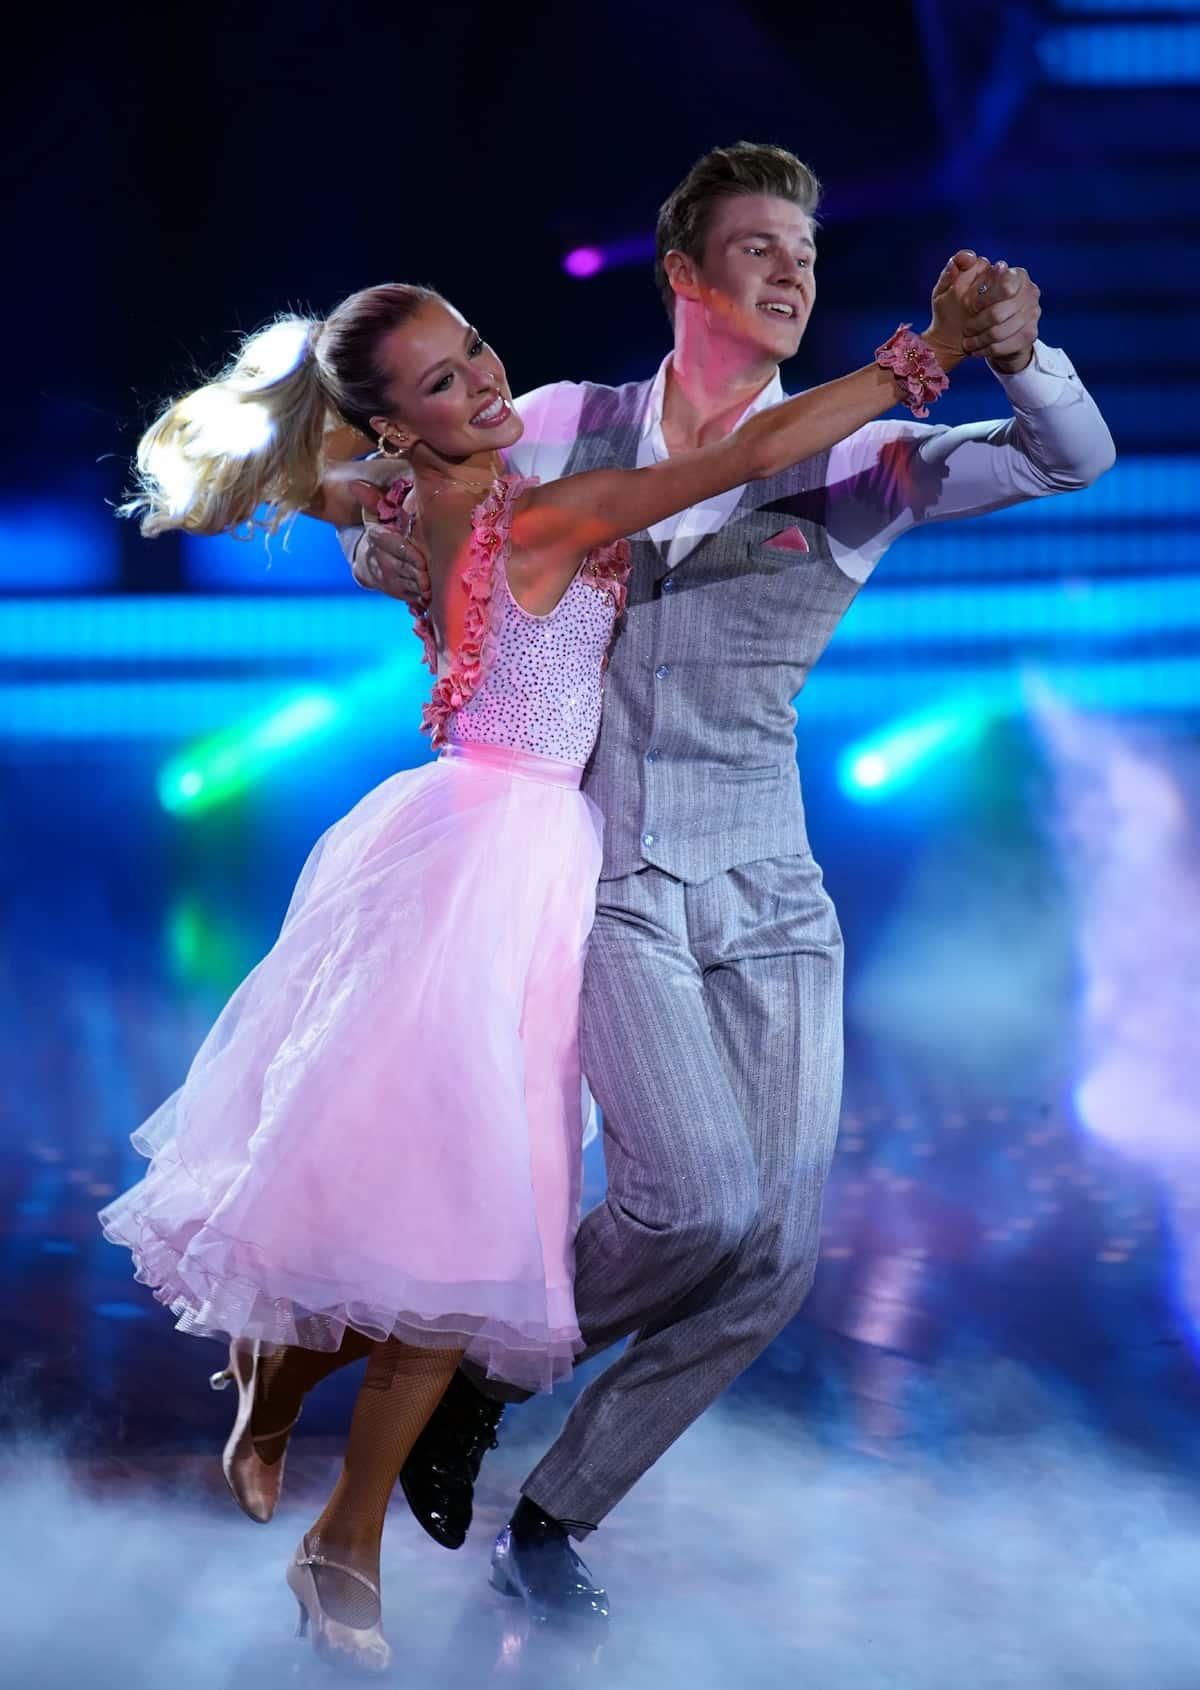 Patricija Belousova - Simon Zachenhuber bei Let's dance am 21.5.2021 ausgeschieden